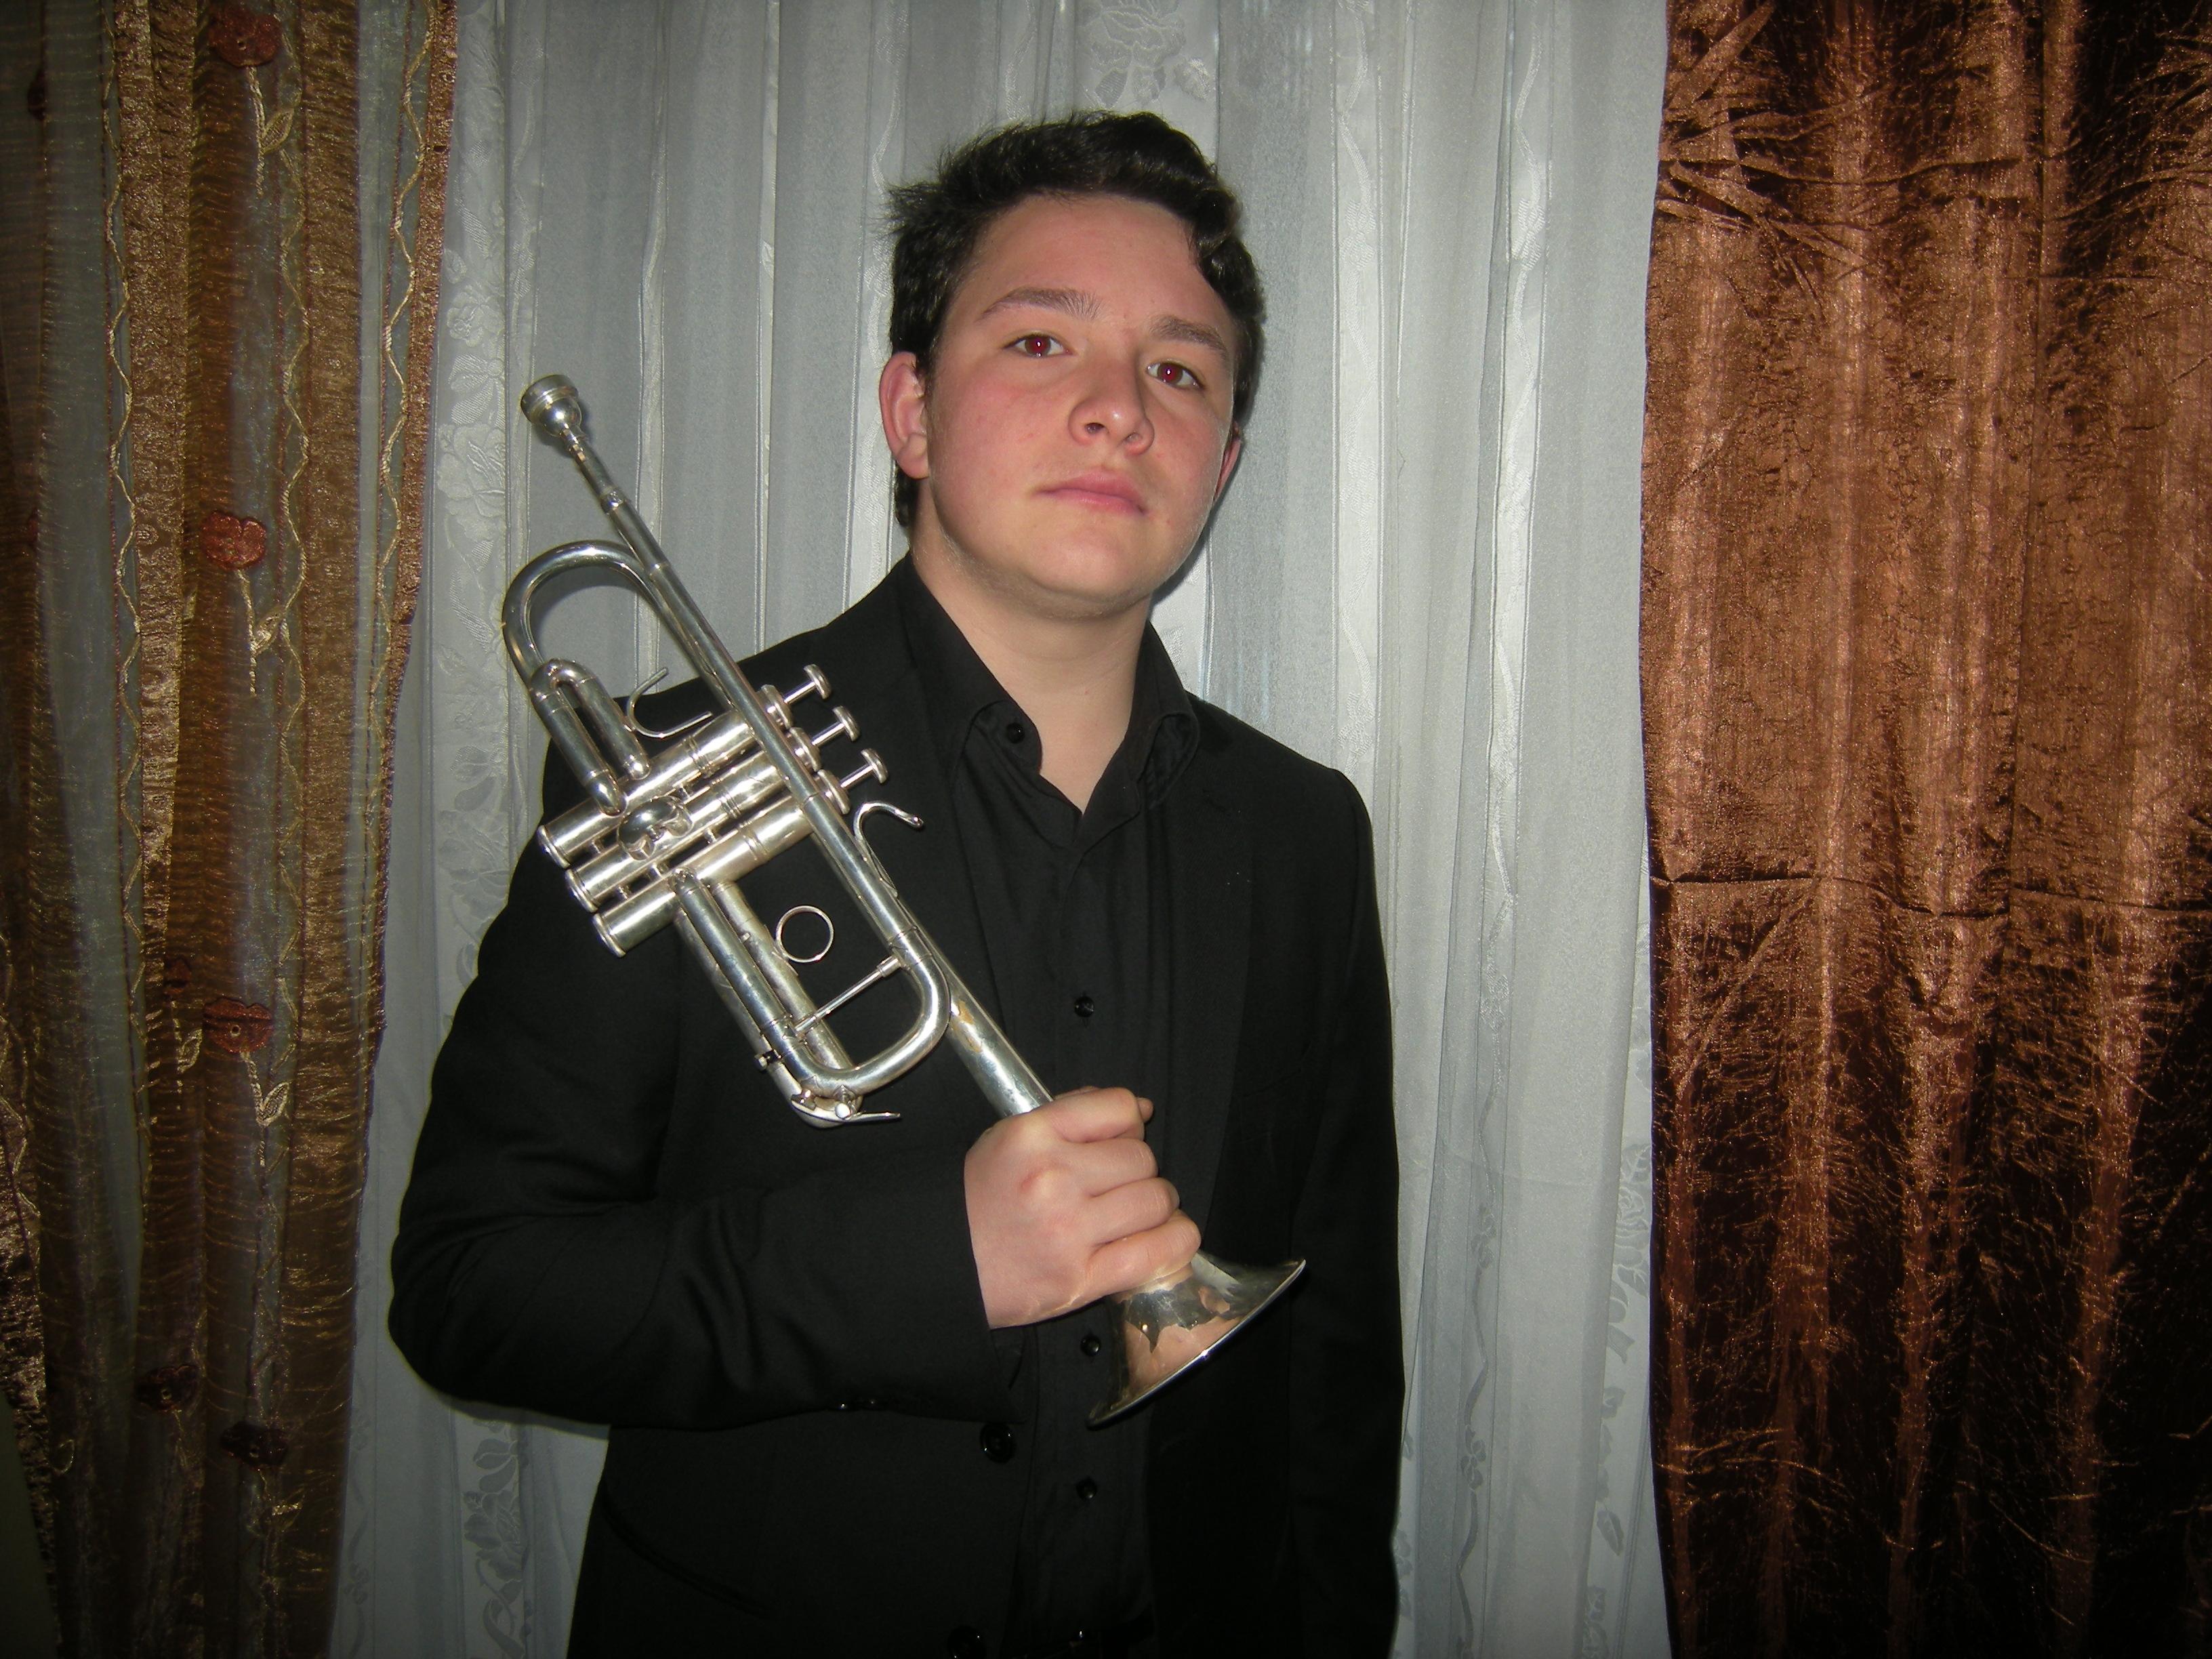 Alessandro Rosi